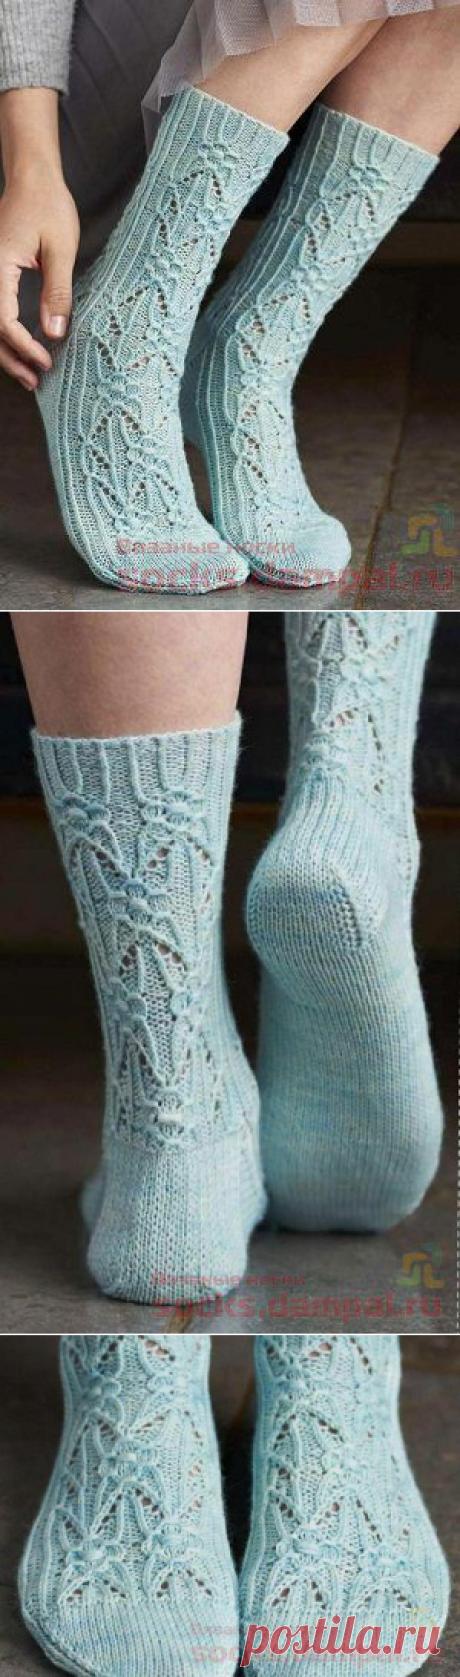 Ажурные носки «Borage» | ВЯЗАНЫЕ НОСКИ